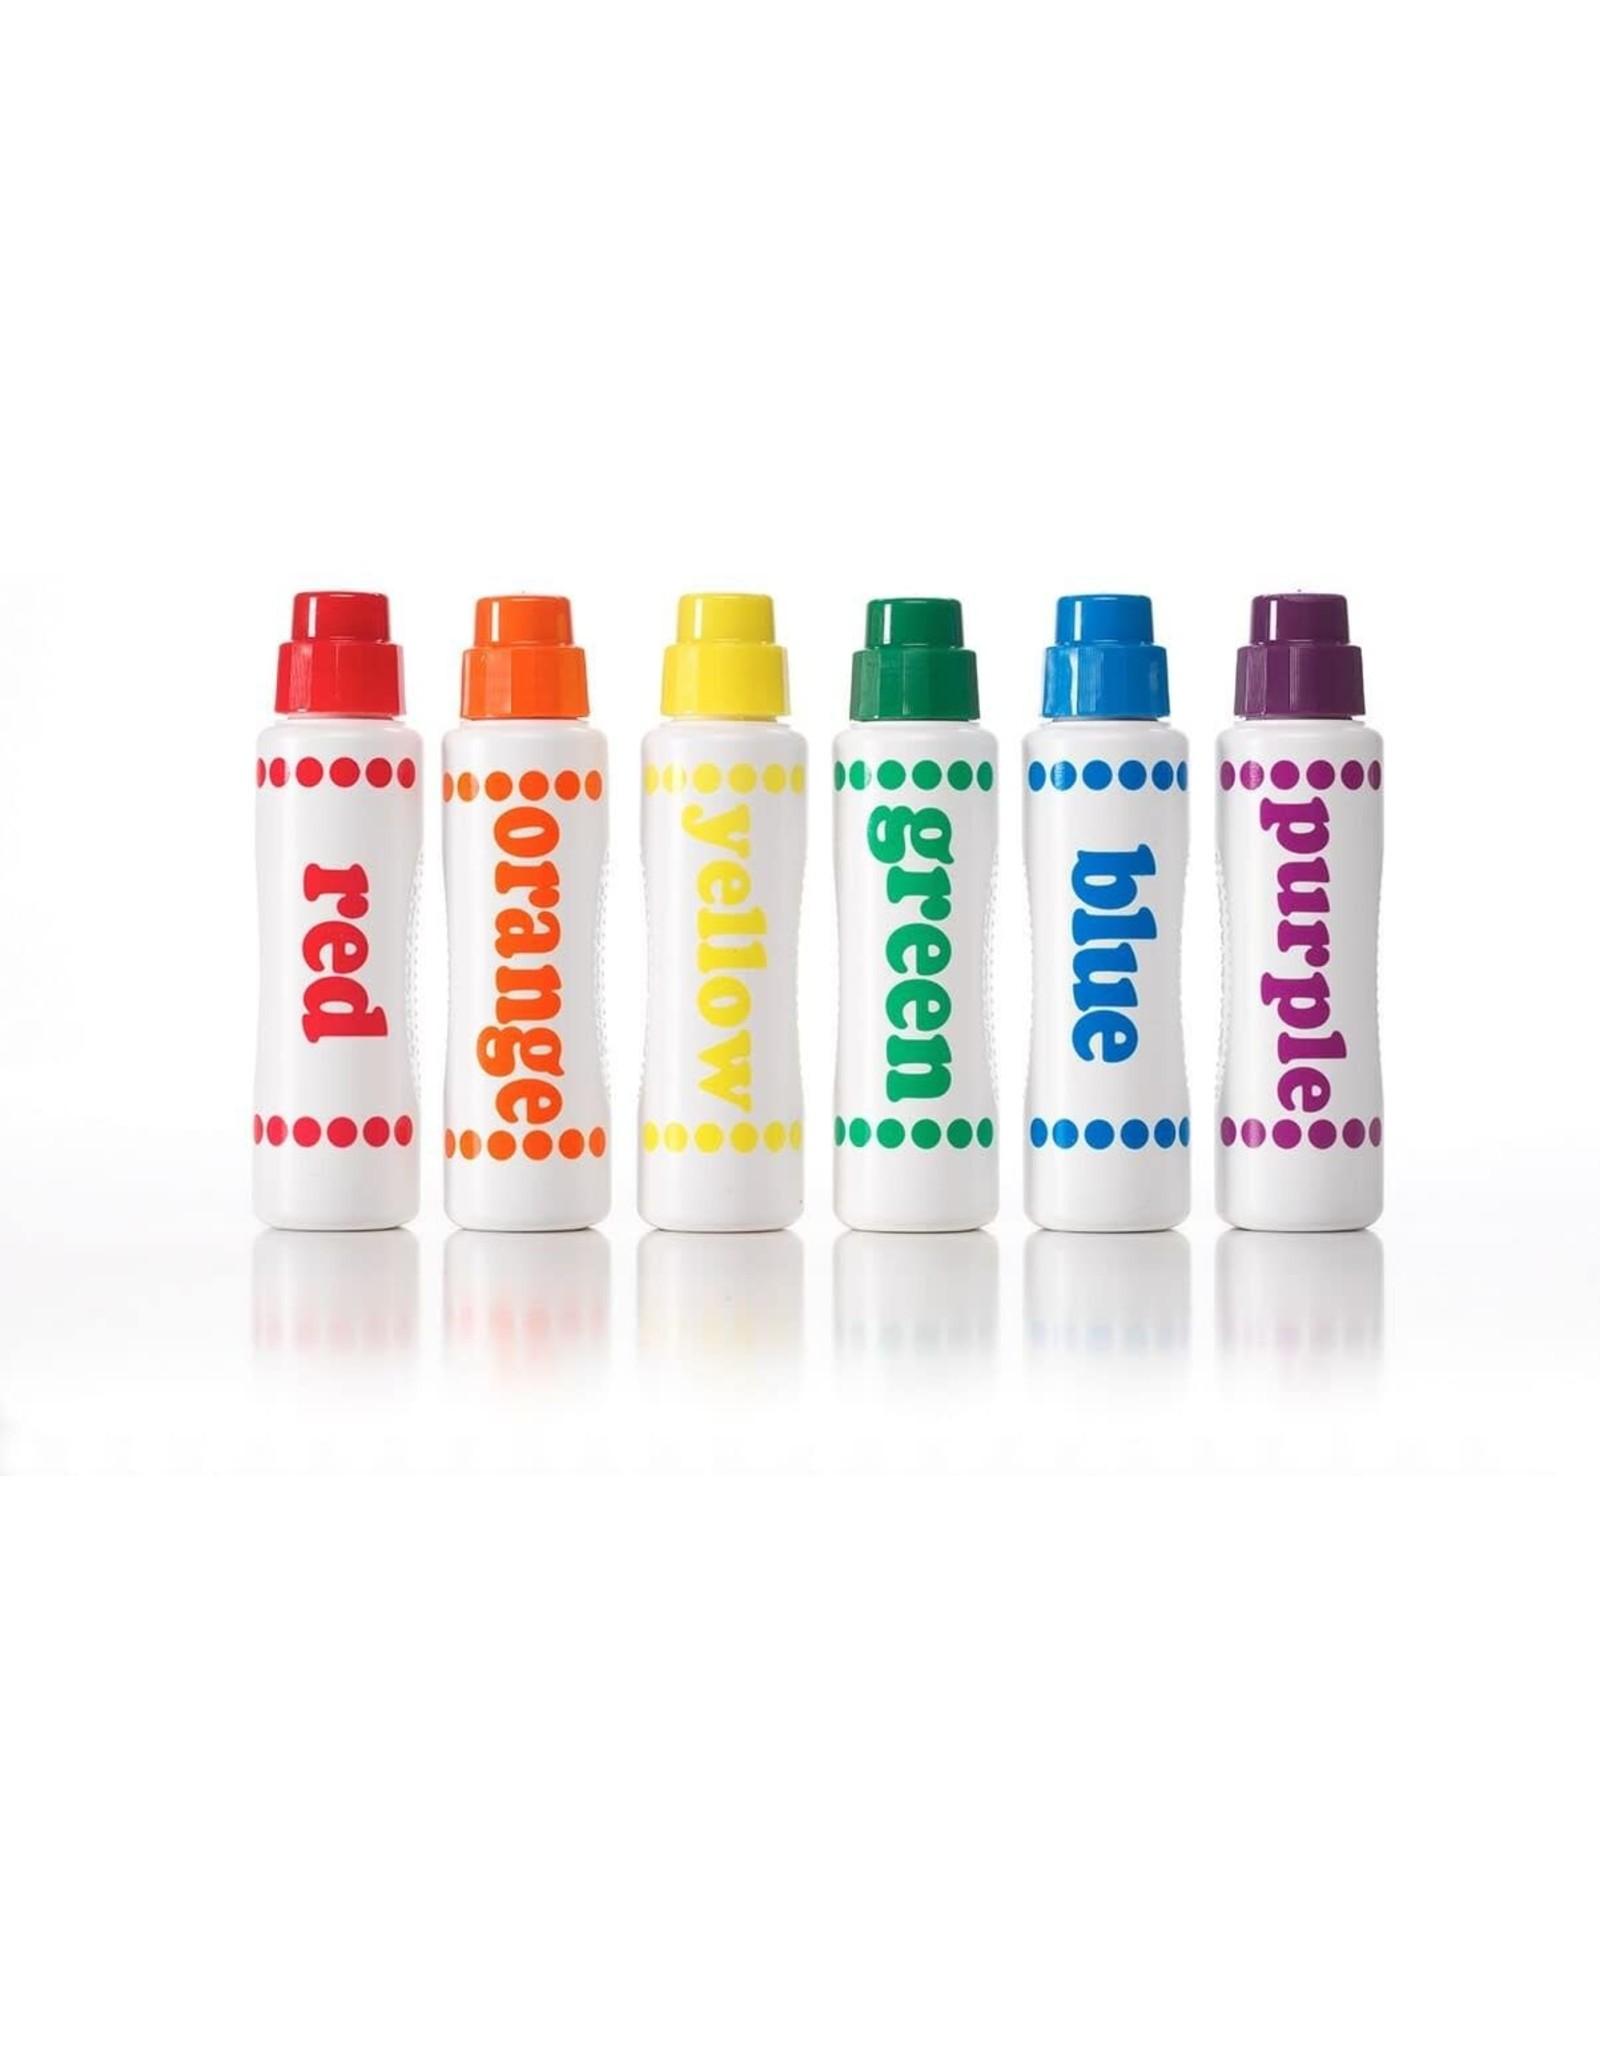 Playwell Rainbow Washable Dot Markers, 6 pk.